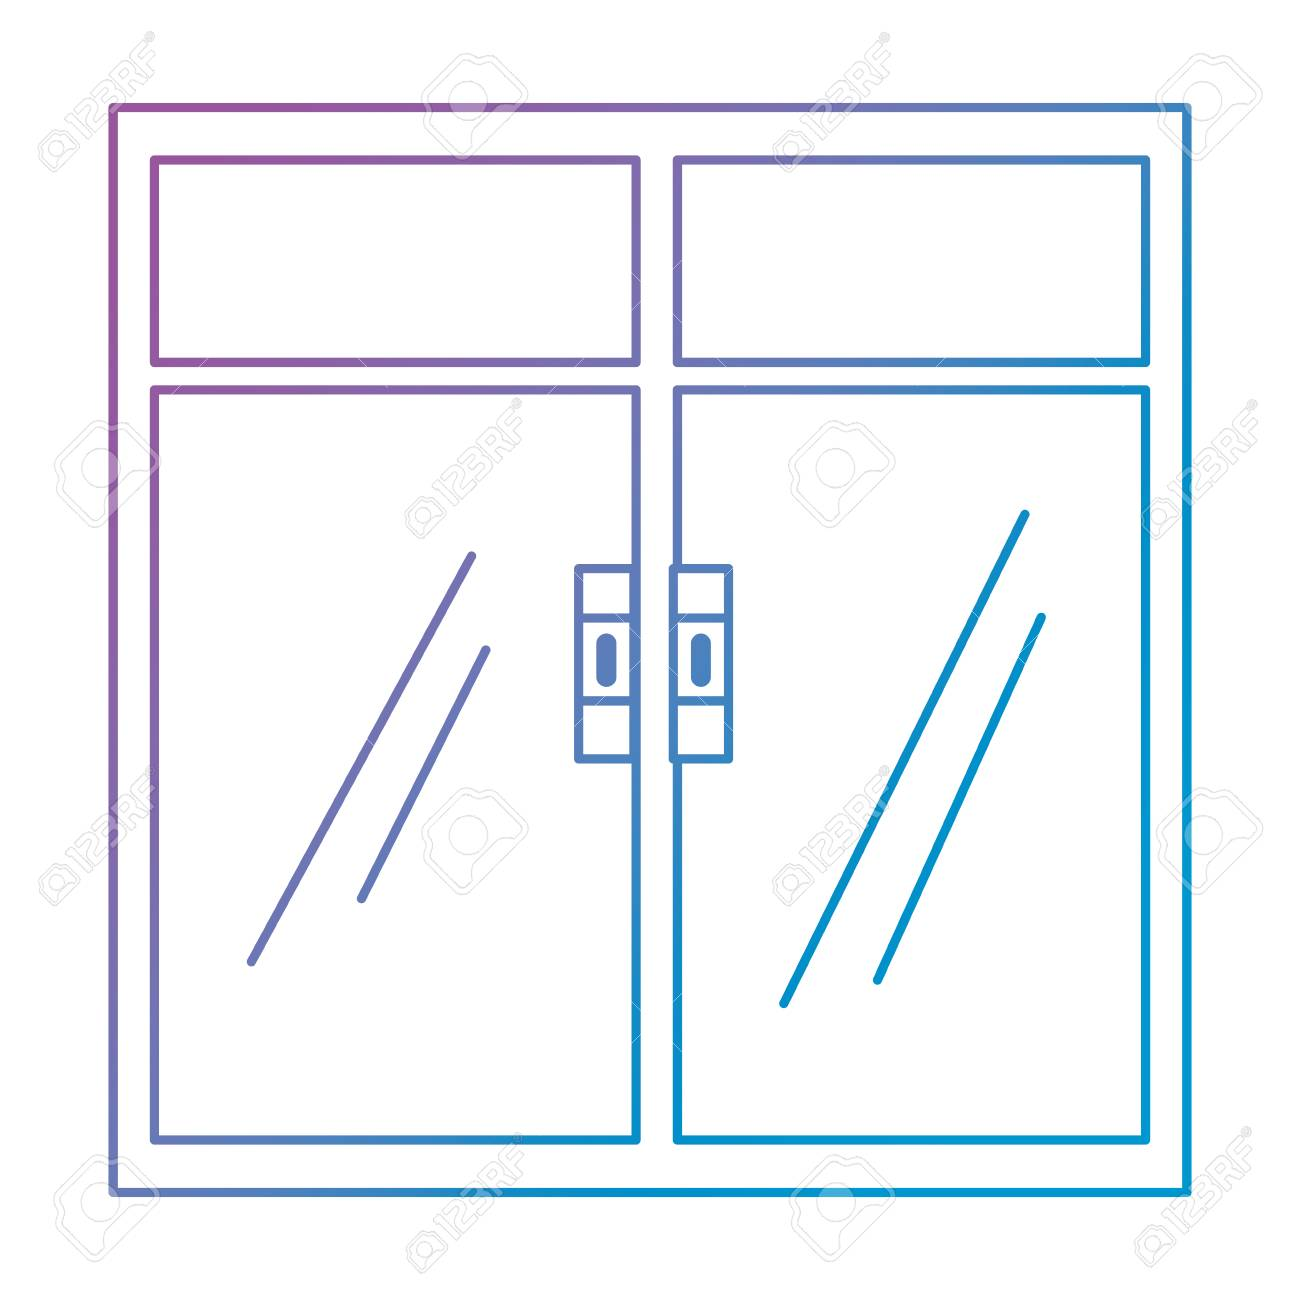 window inside isolated icon vector illustration design - 104819889